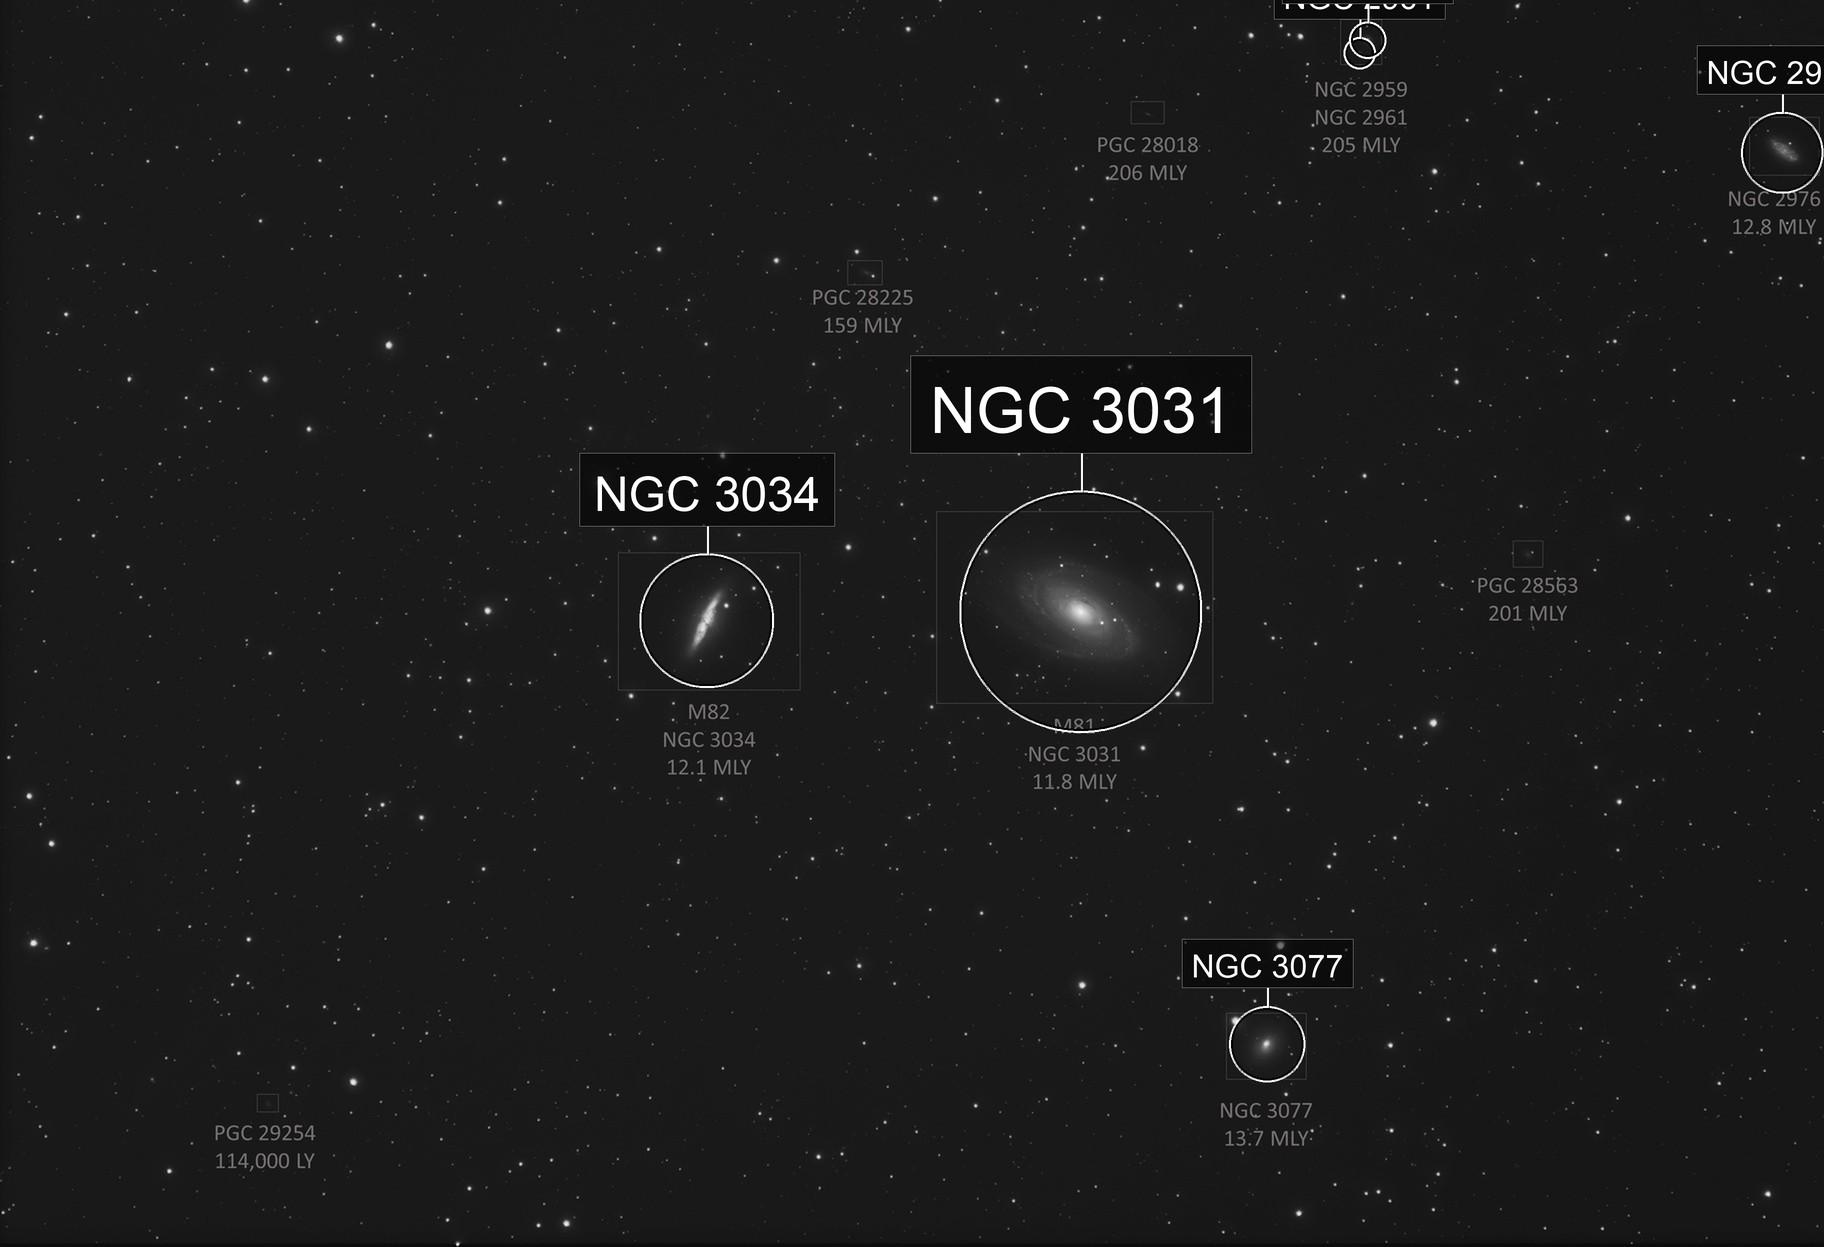 M81-M82 High Resolution, Wide Field